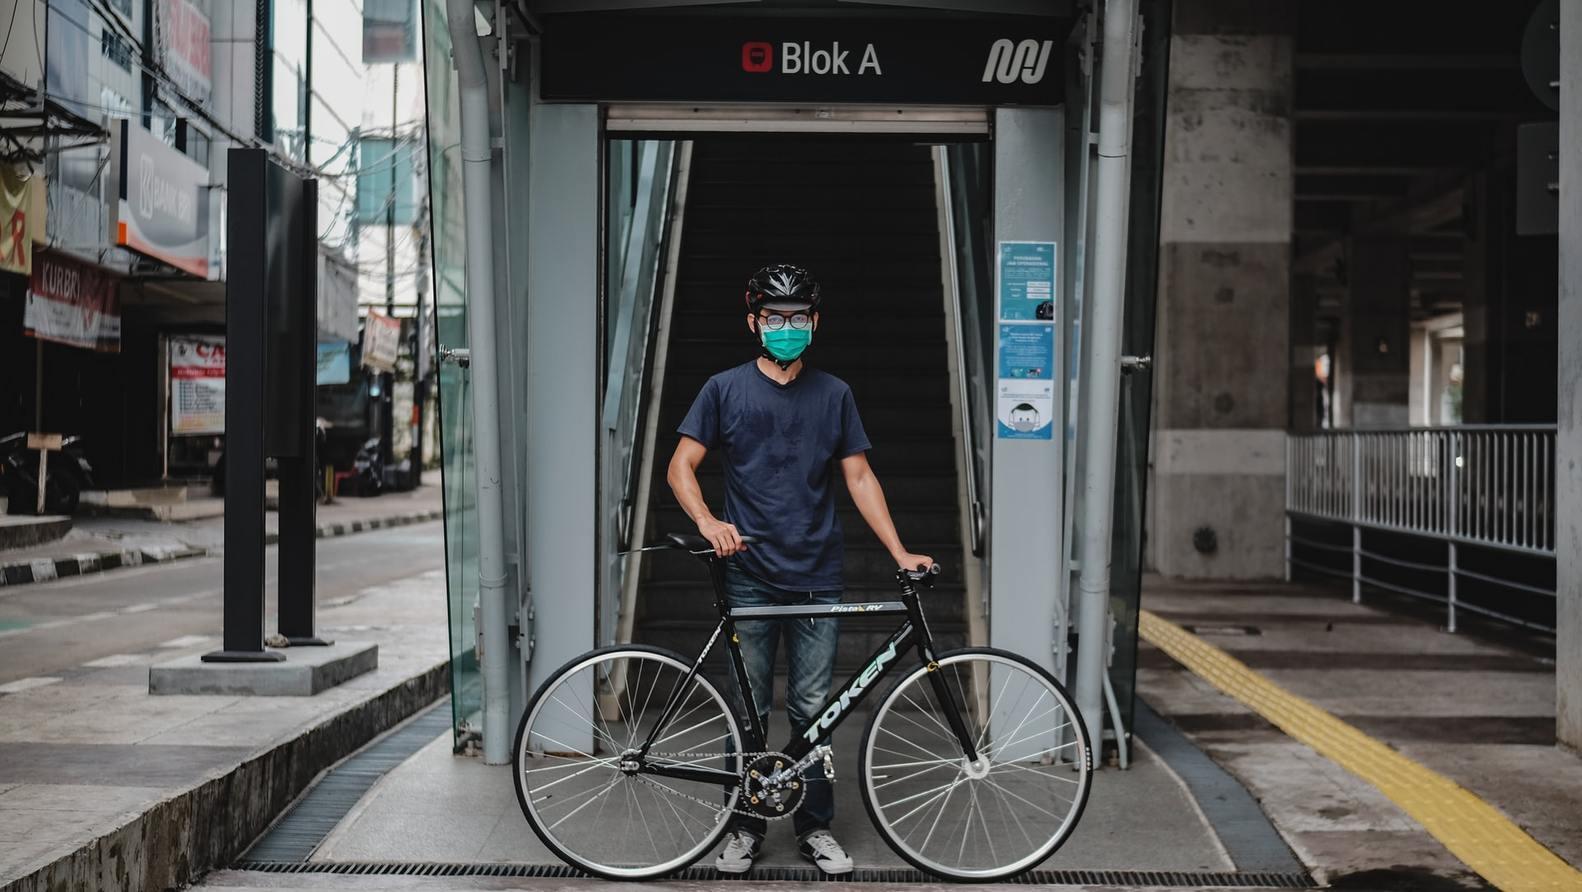 ciclista com máscara na frente da entrada do metrô